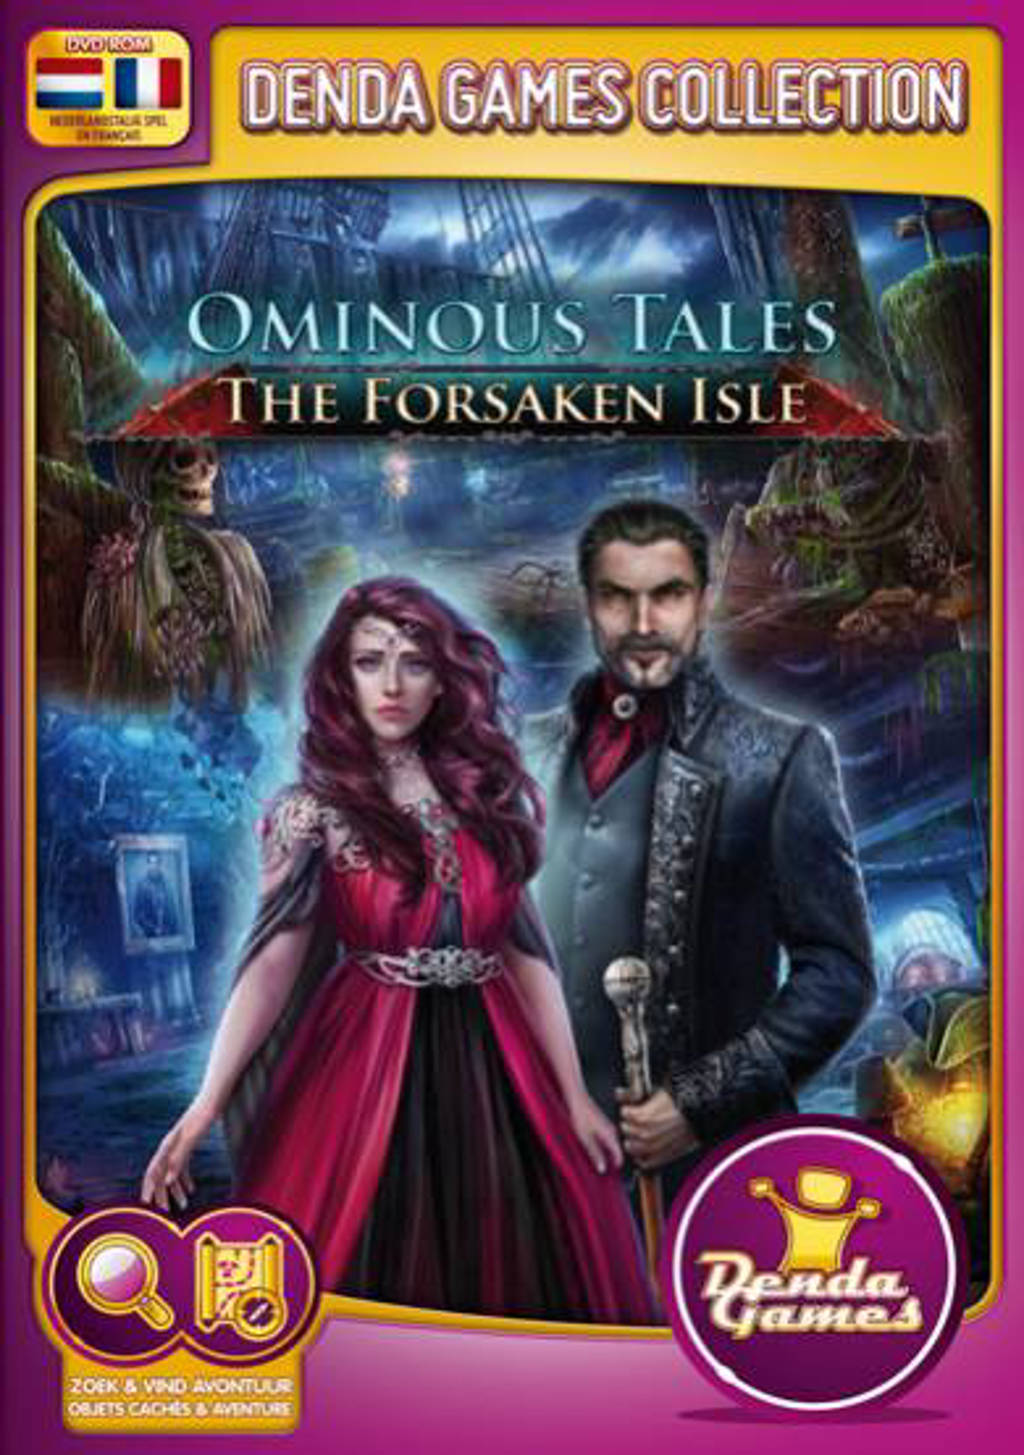 Ominous tales - The forsaken isle (PC)